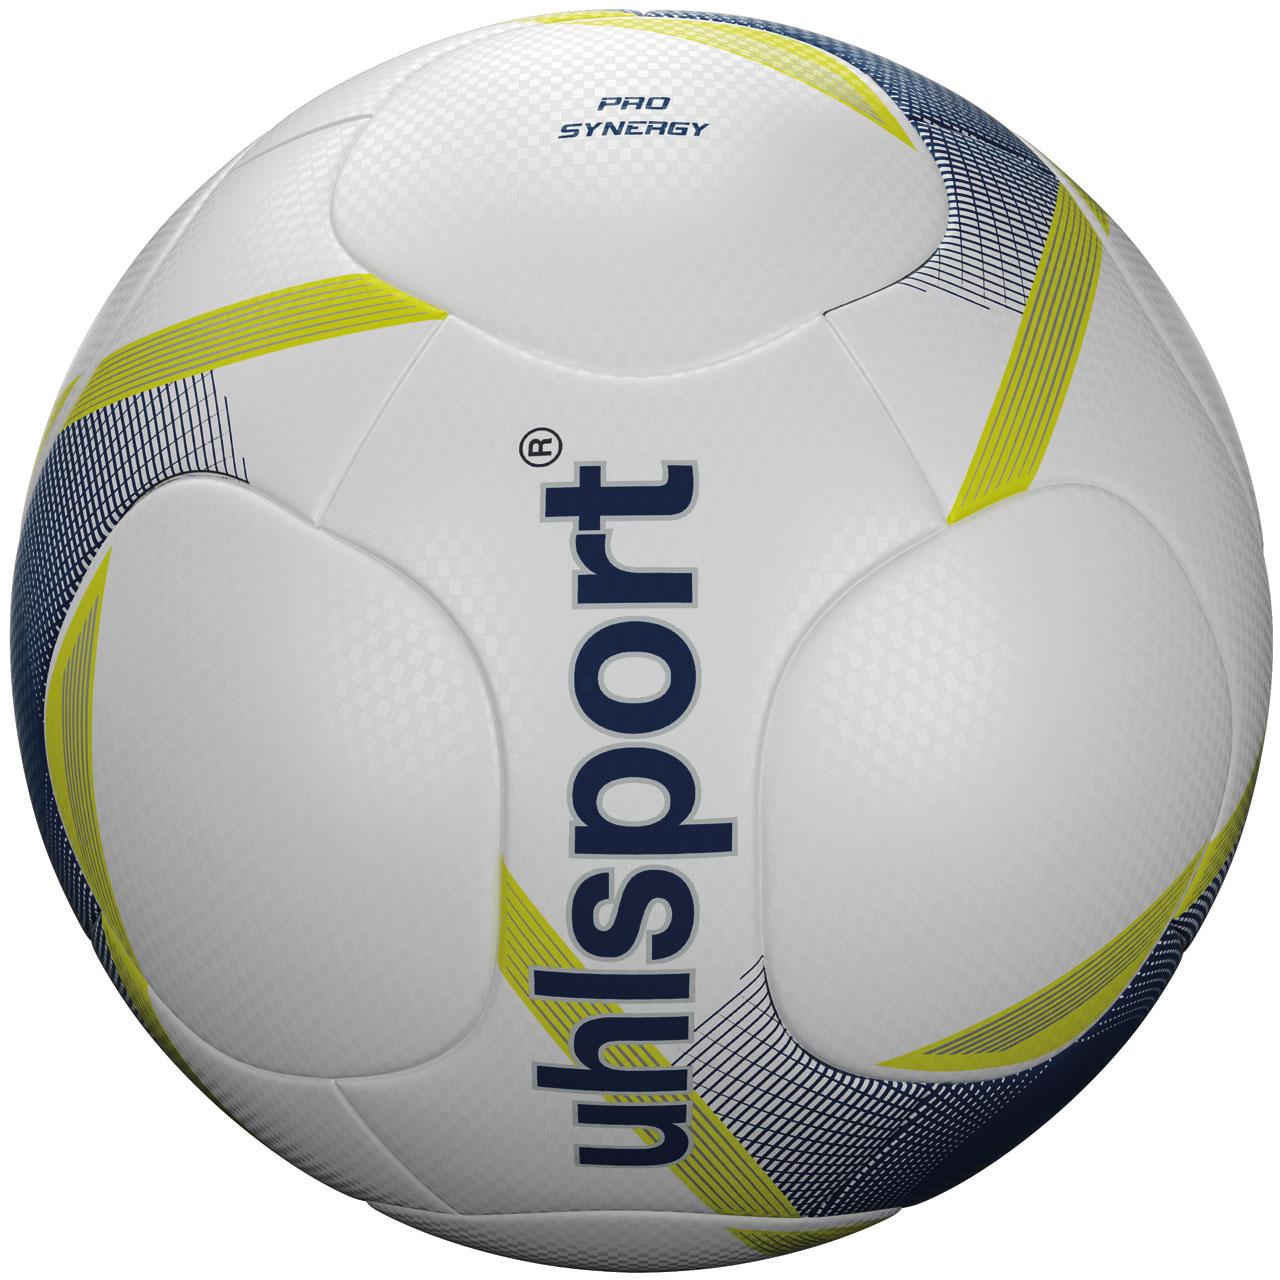 FuГџballspiel Online